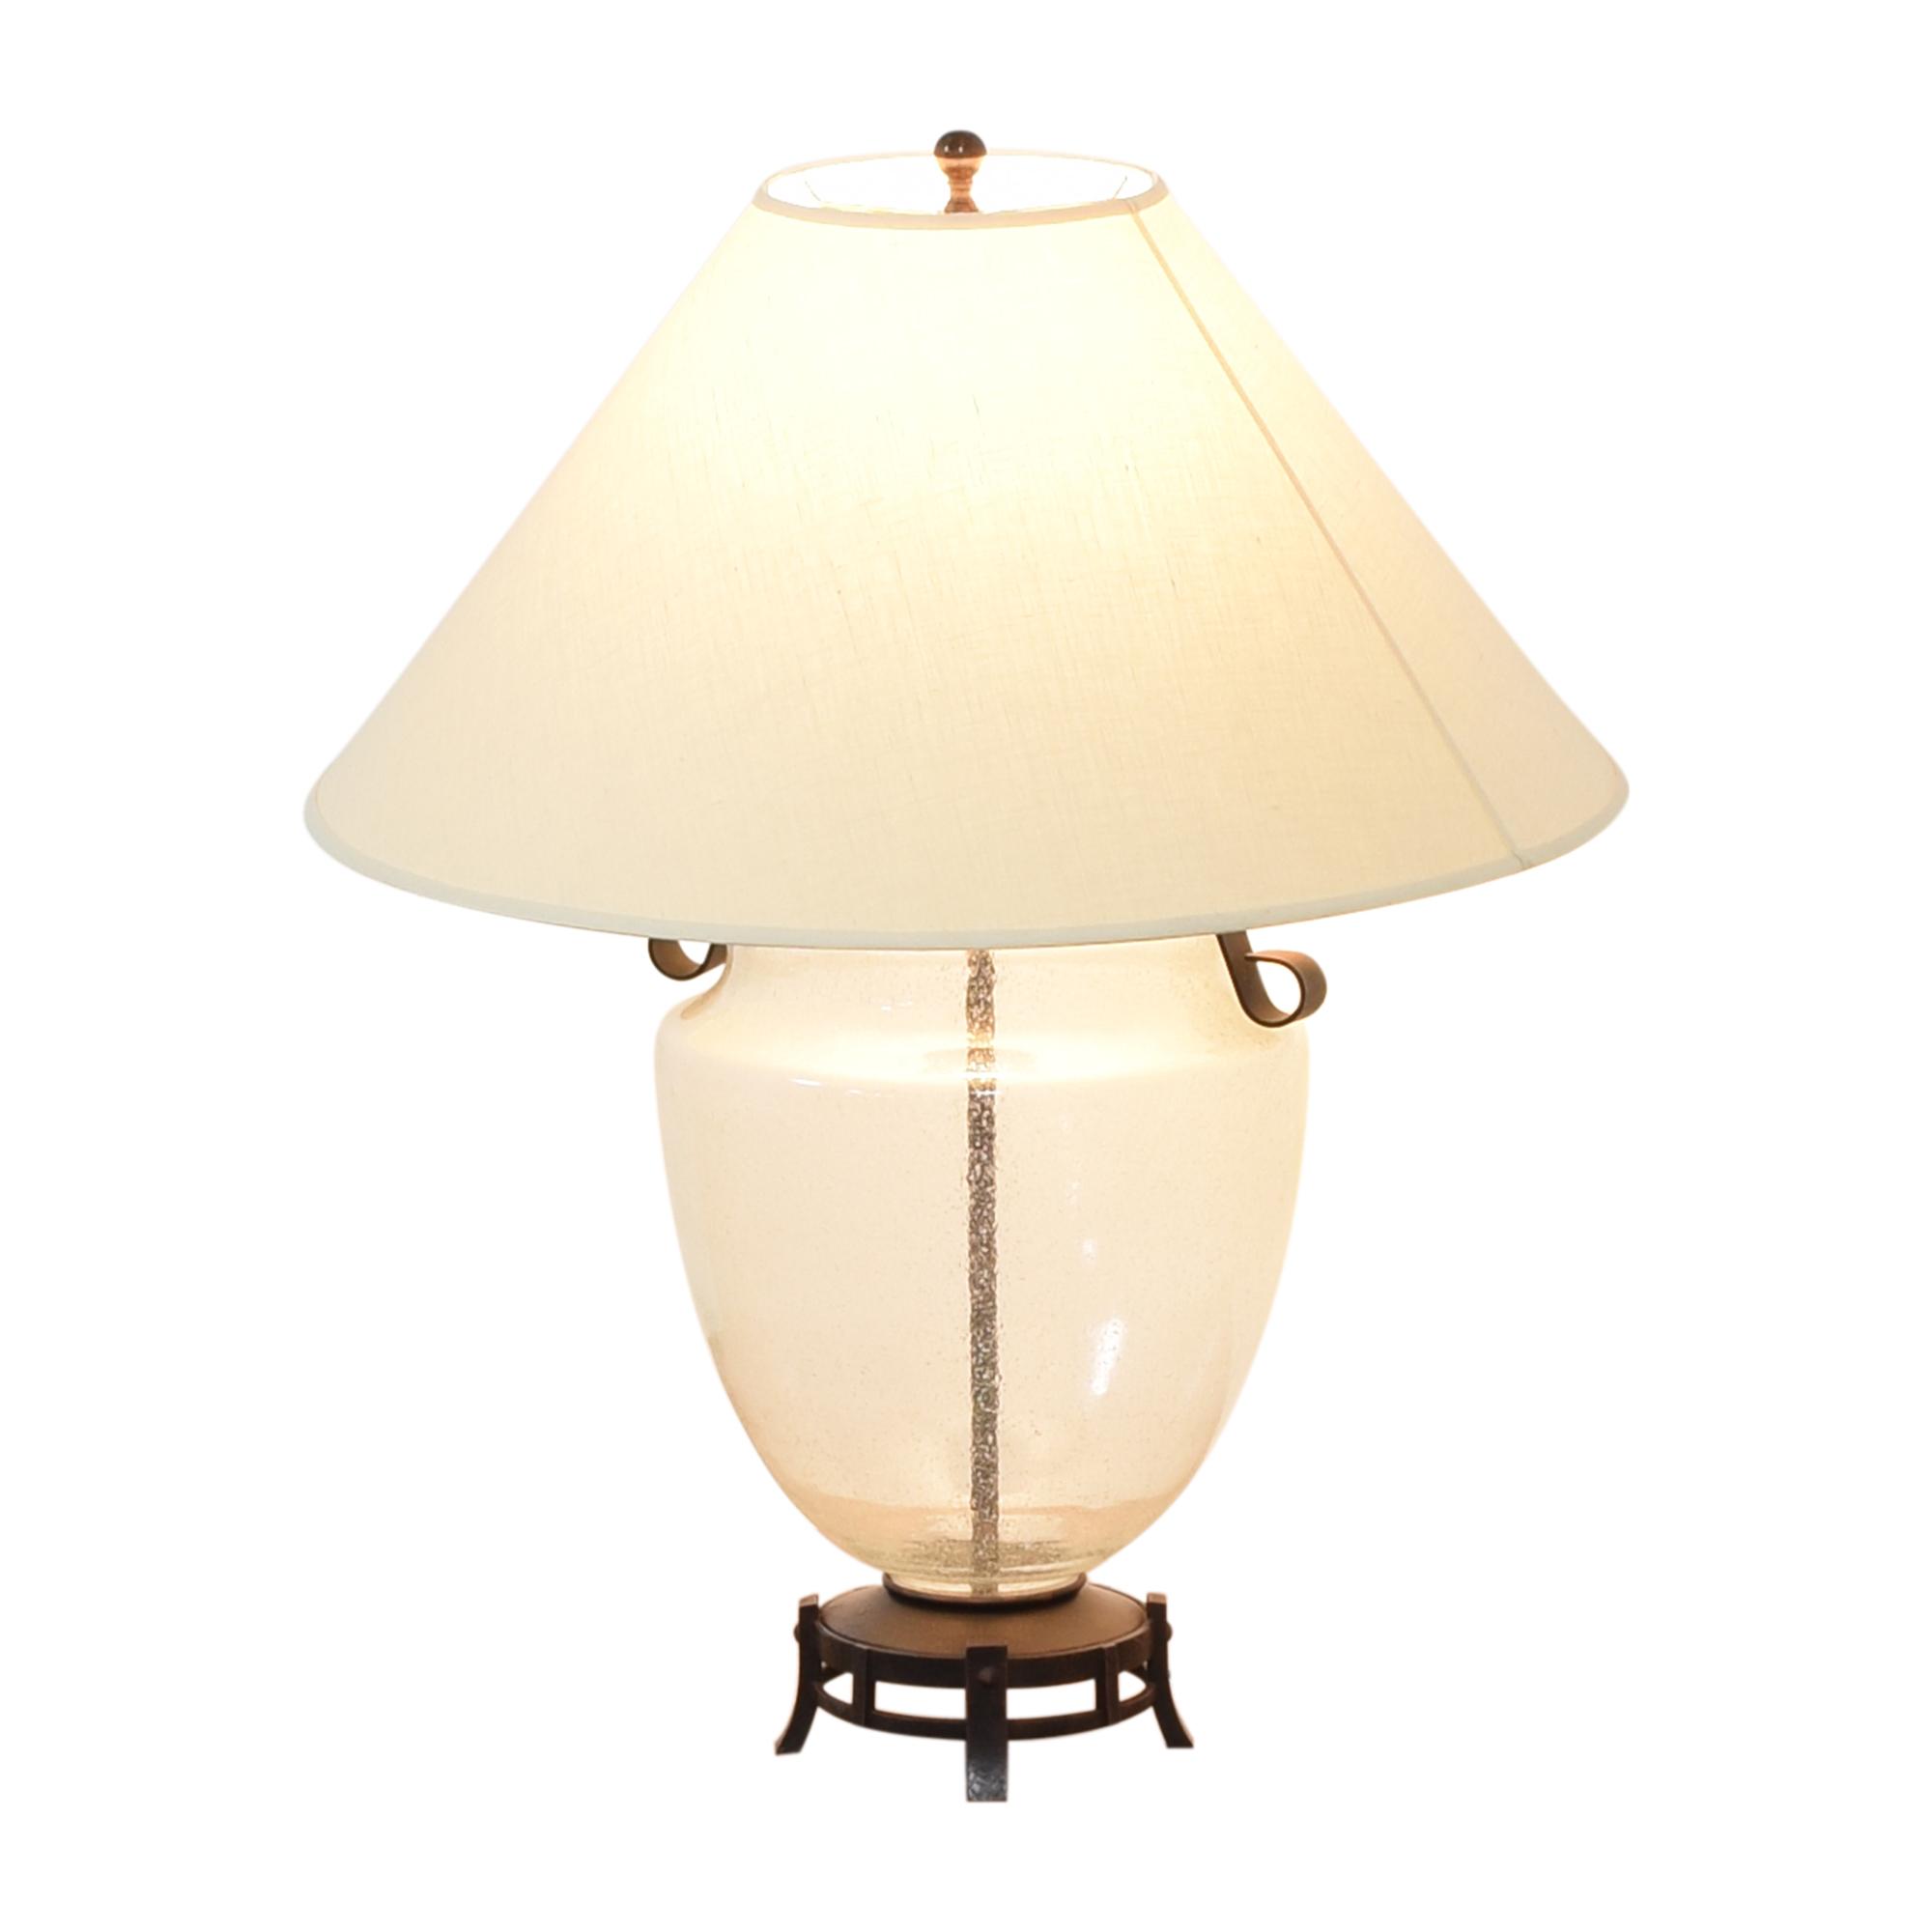 buy Ethan Allen Modern Table Lamp Ethan Allen Decor